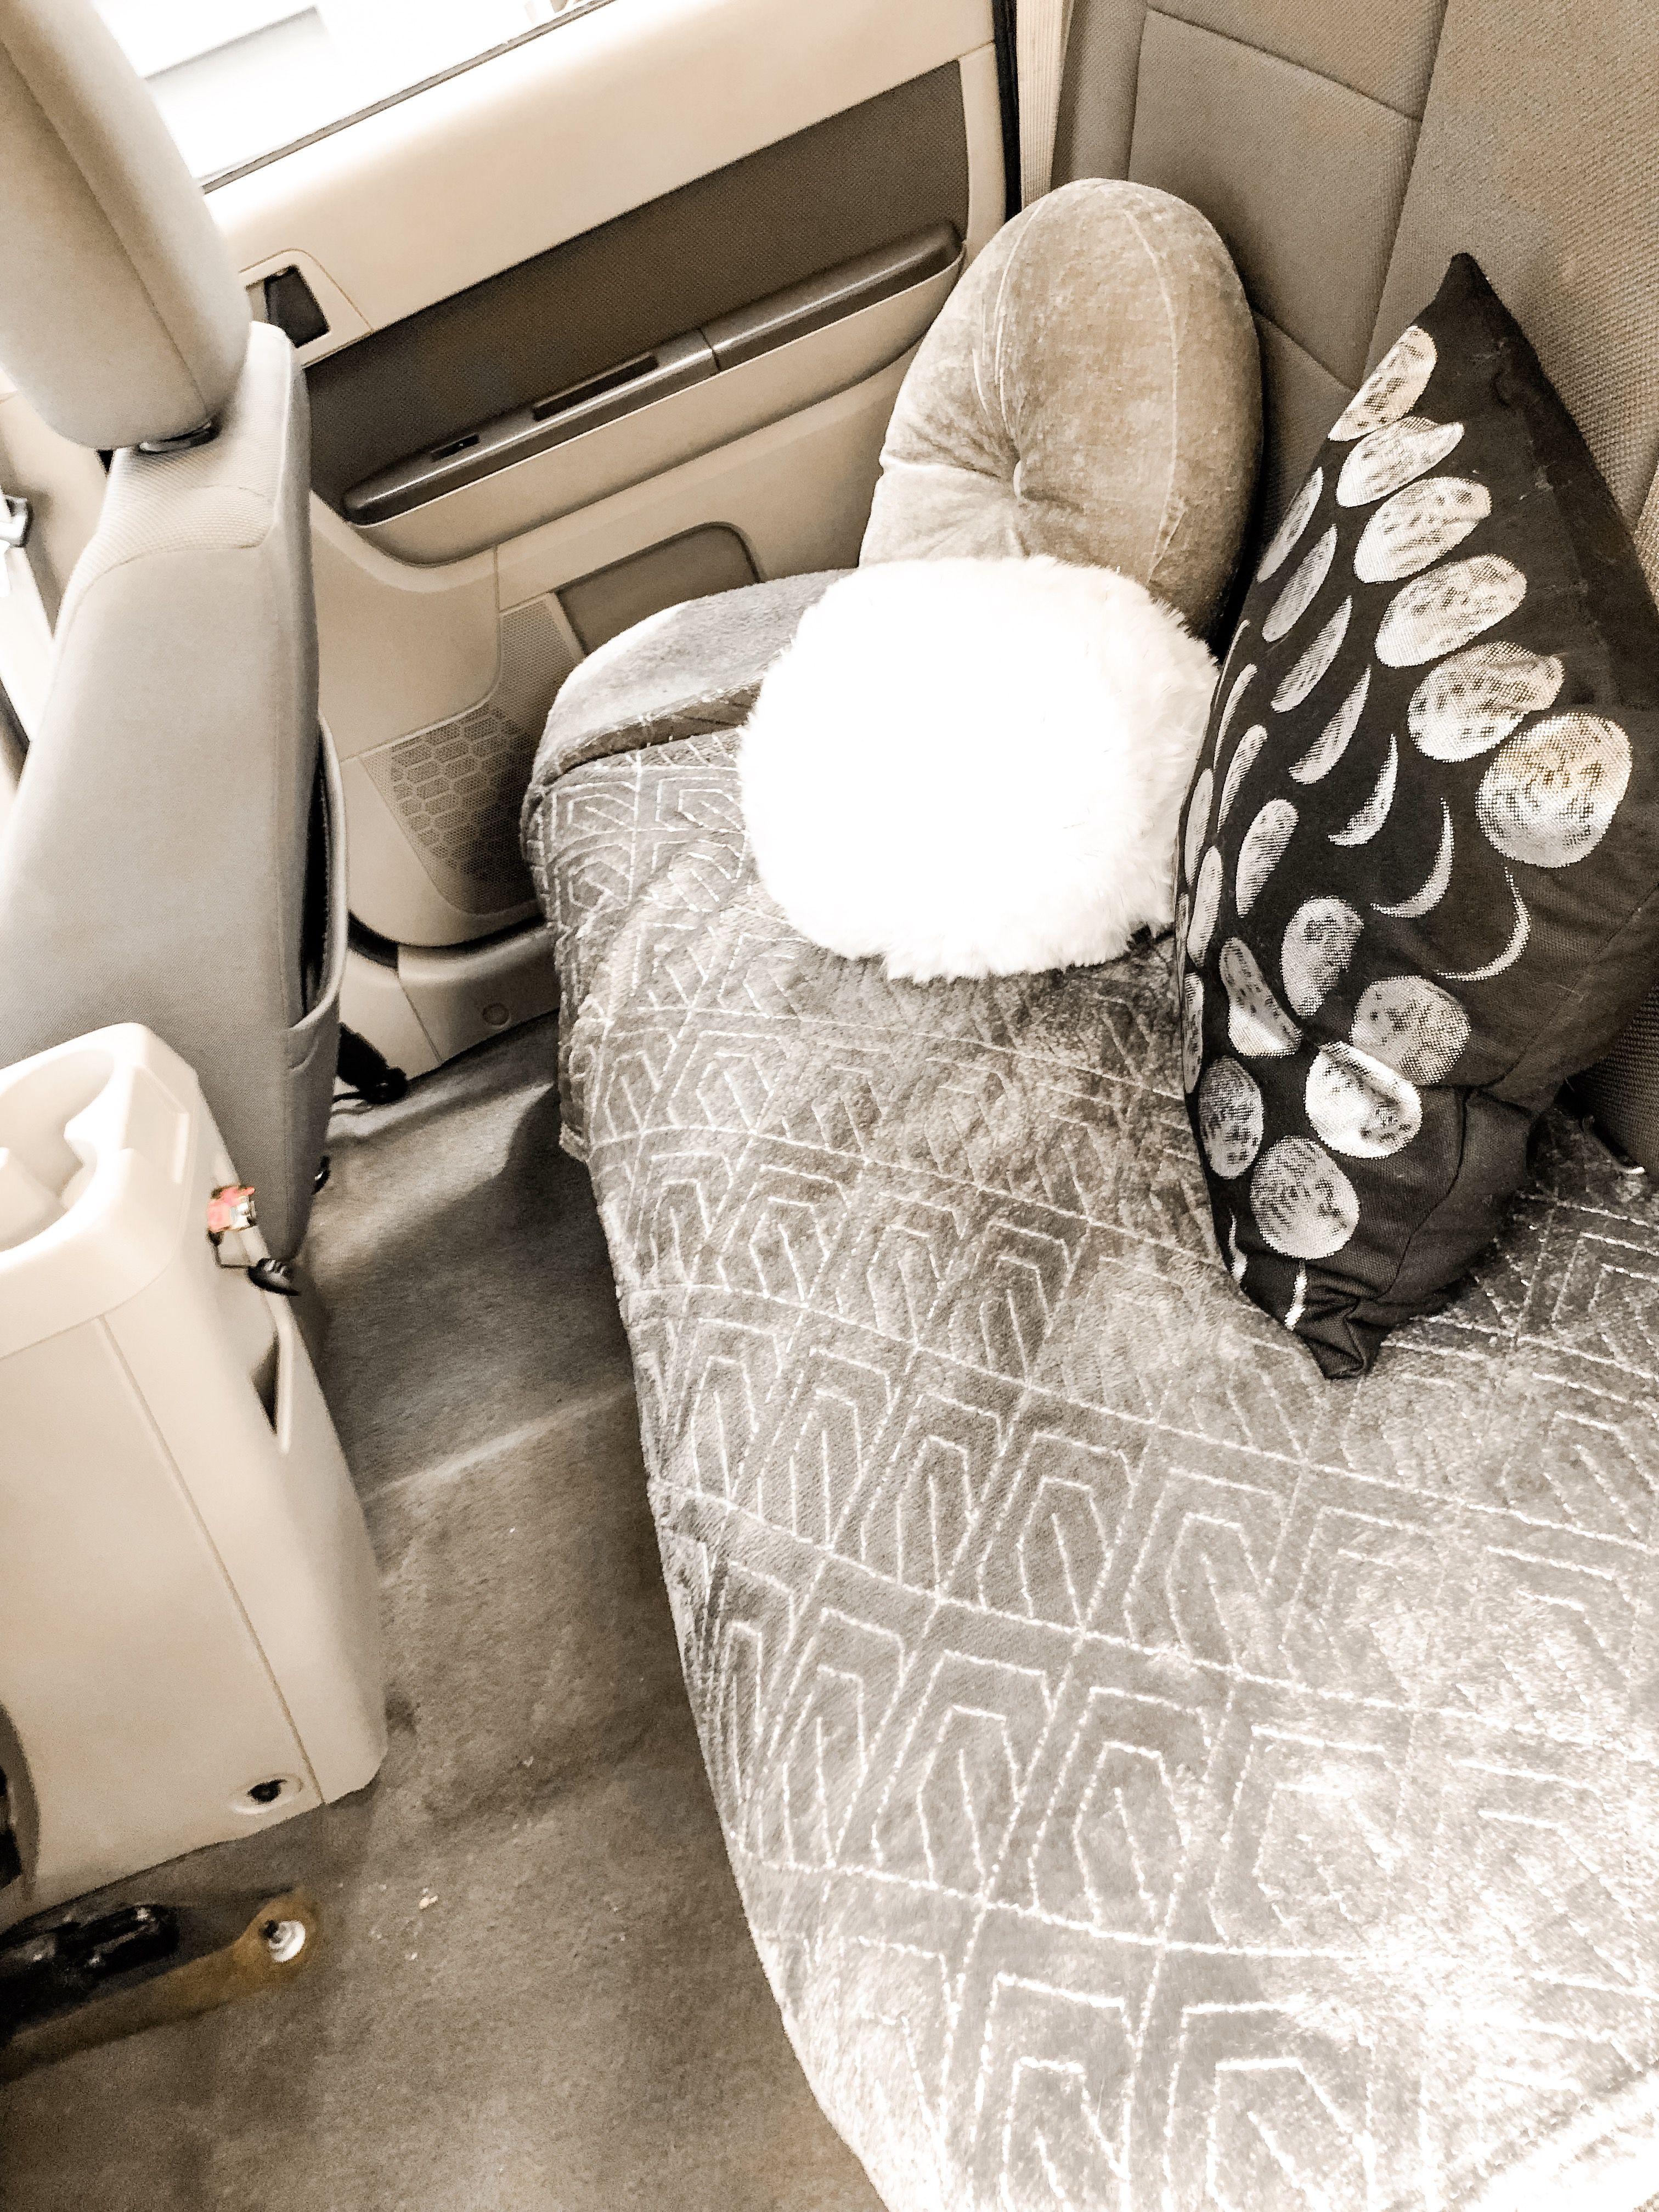 Cute Car Set Up Backseat Vsco Girly Car Accessories Car